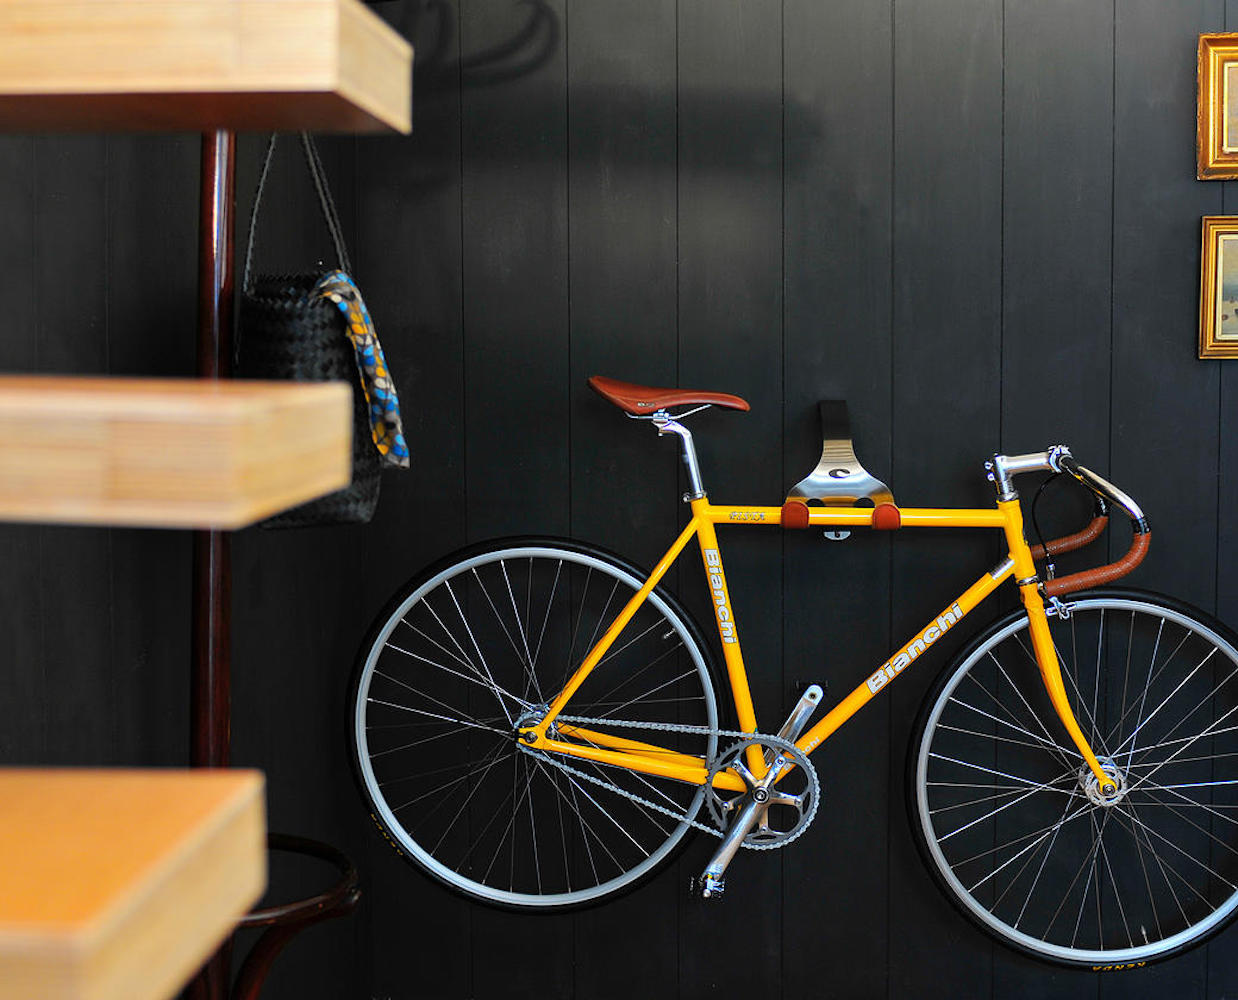 cactus-tongue-ssl-wall-mounted-bike-hanger-02